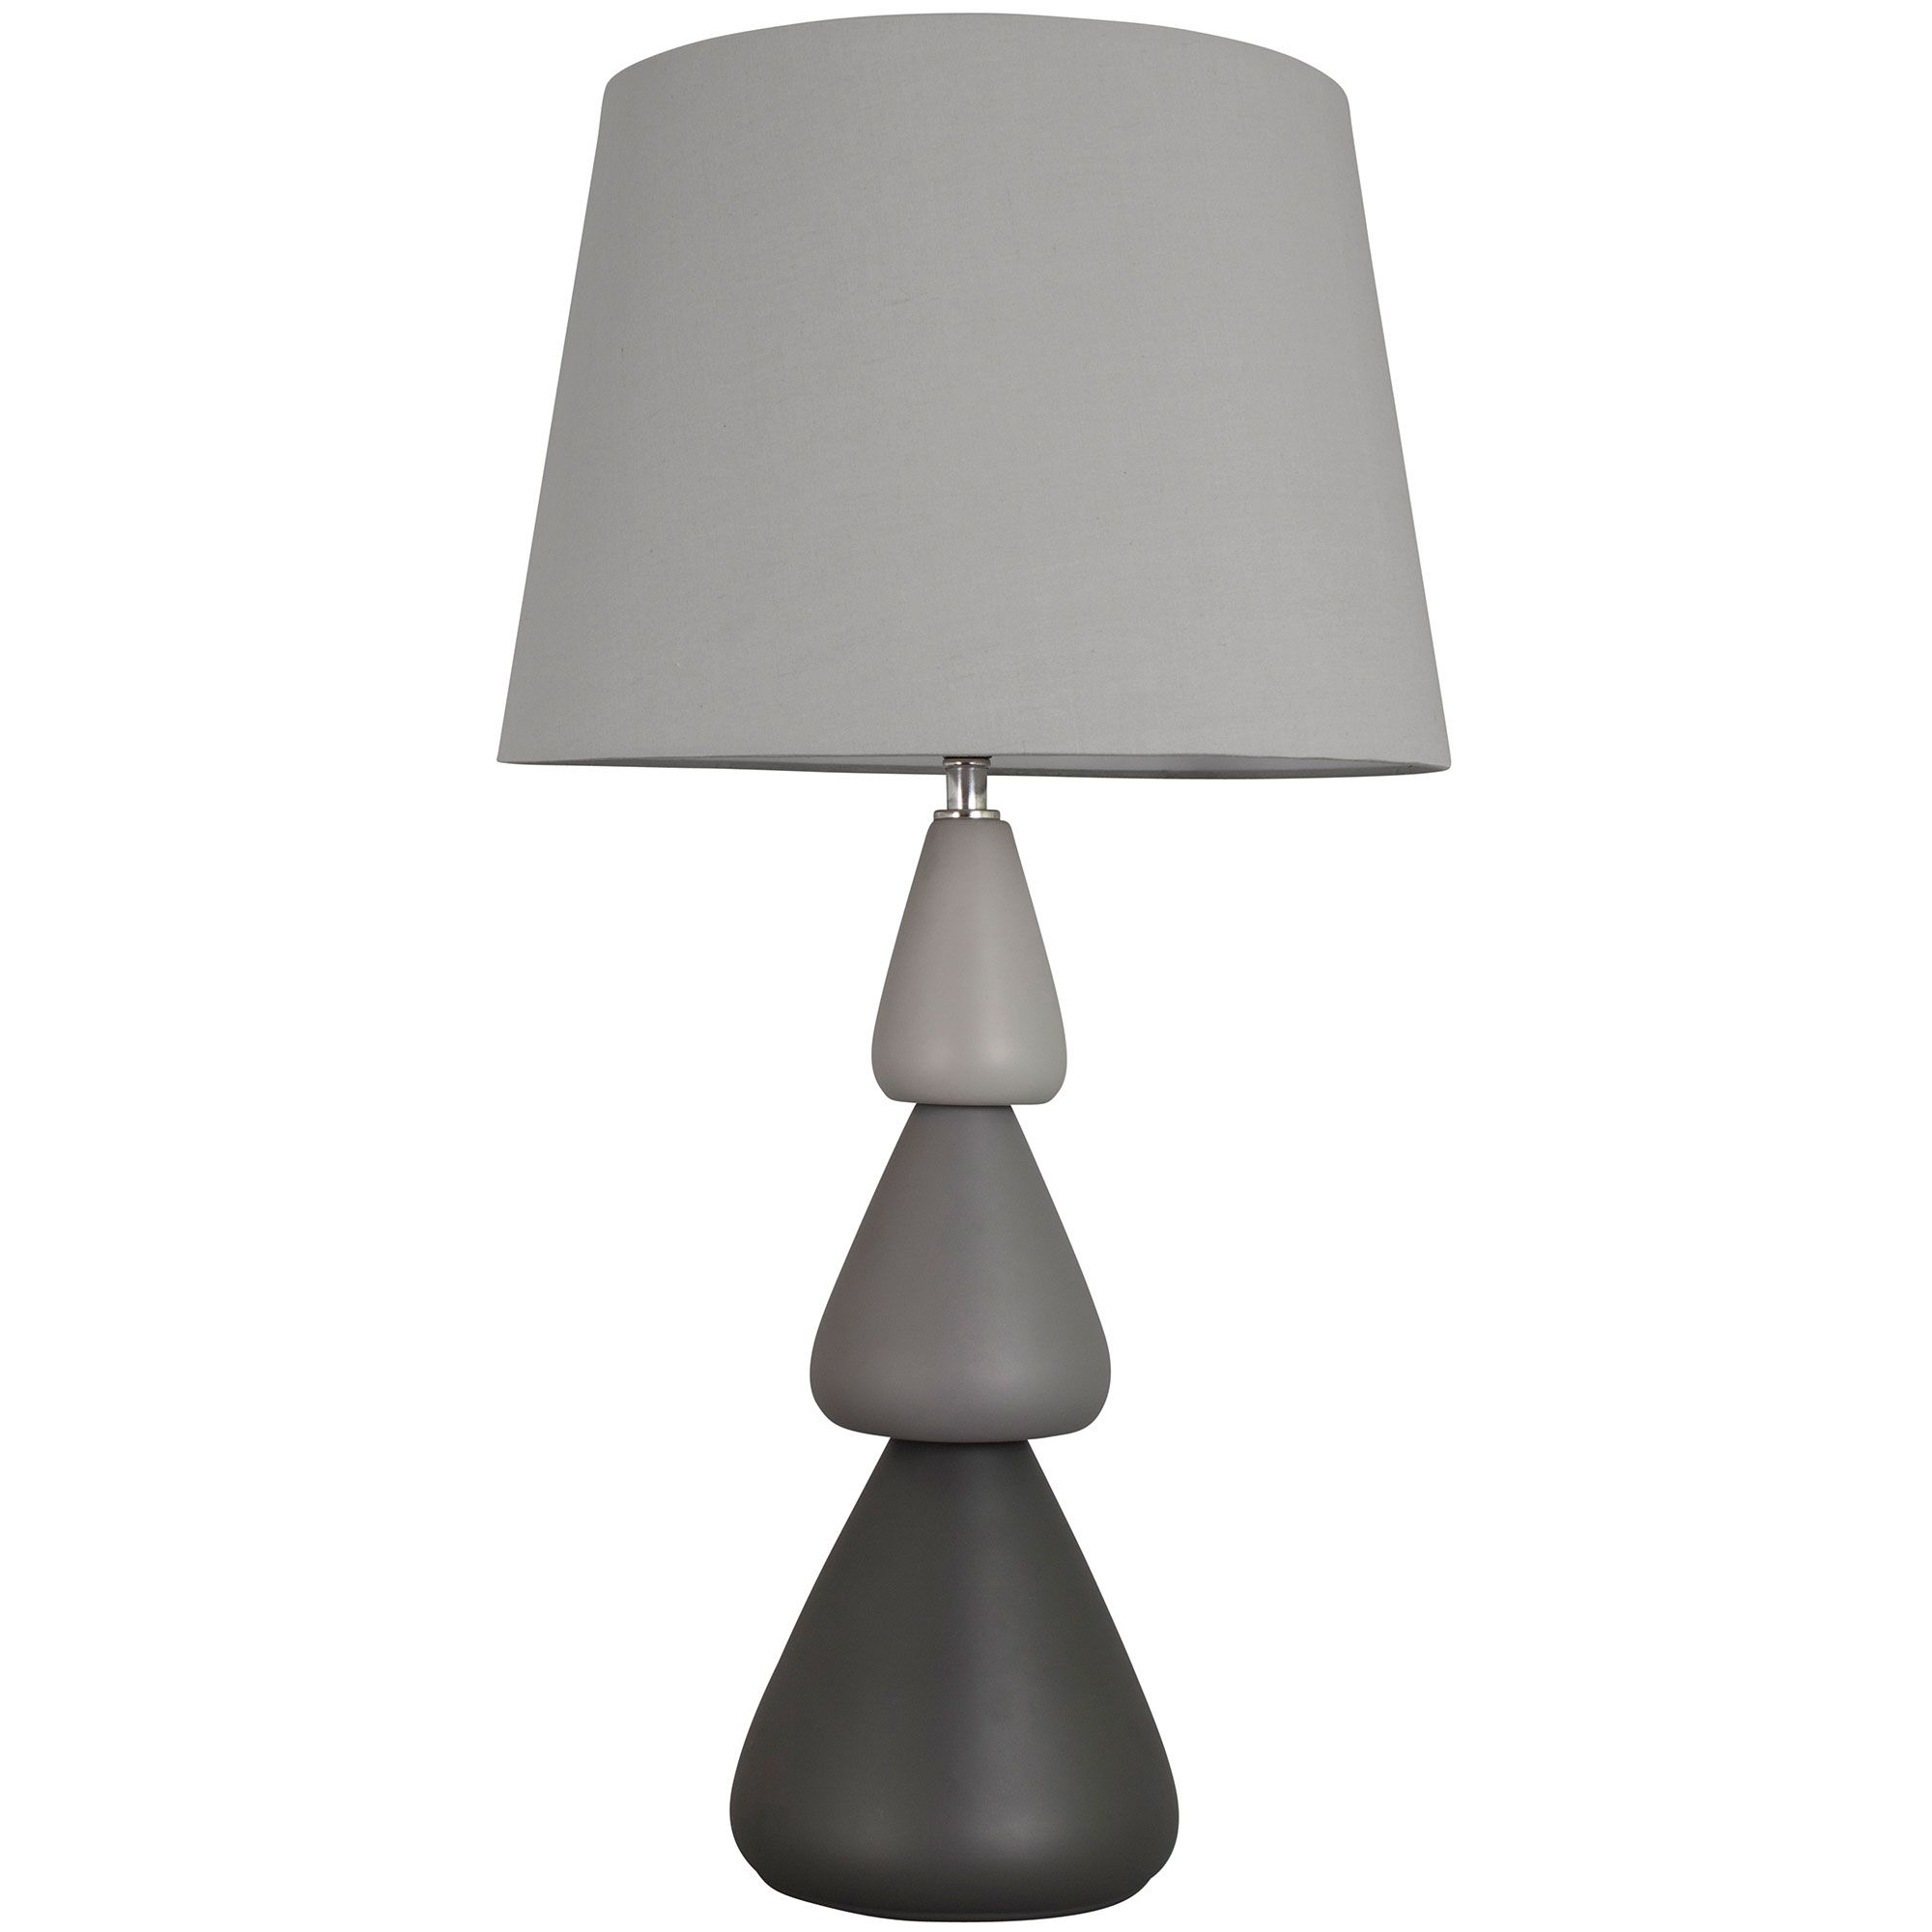 Finley 67cm Table Lamp